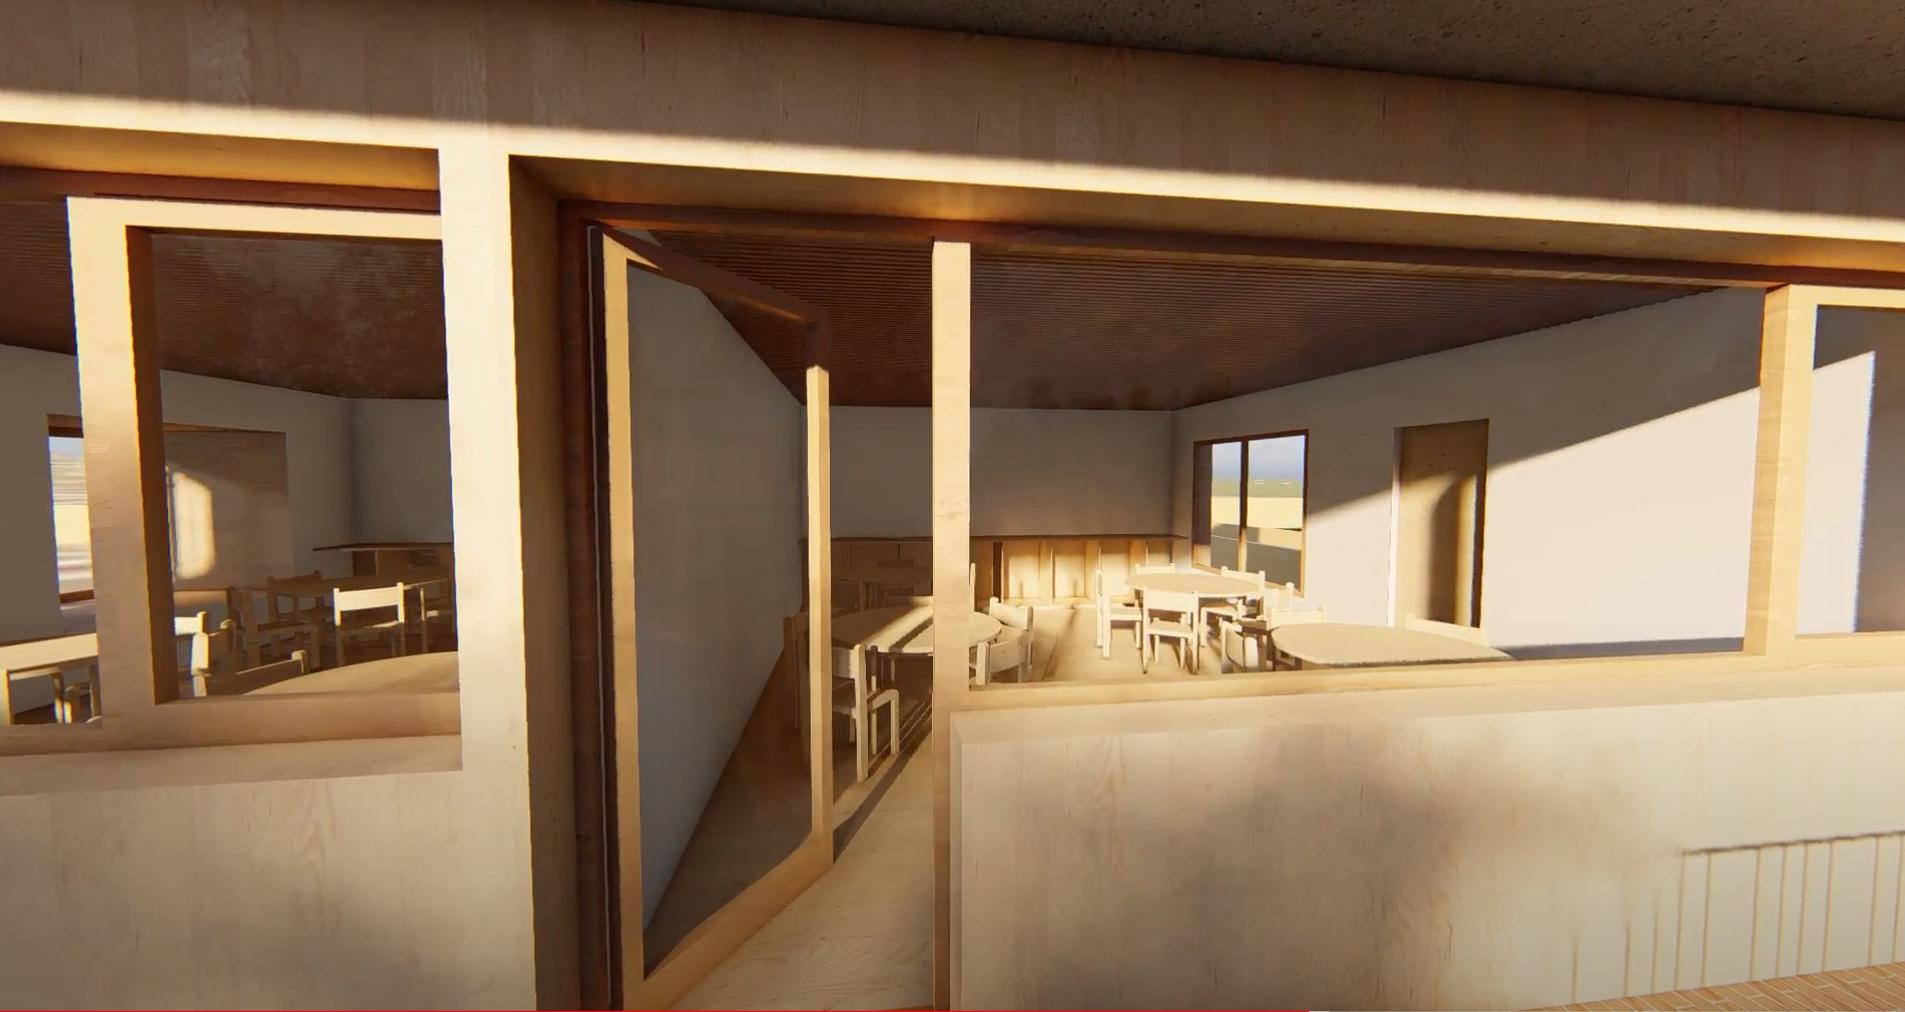 Two Secondary school rooms on the first floor - - international Montessori School of Mallorca